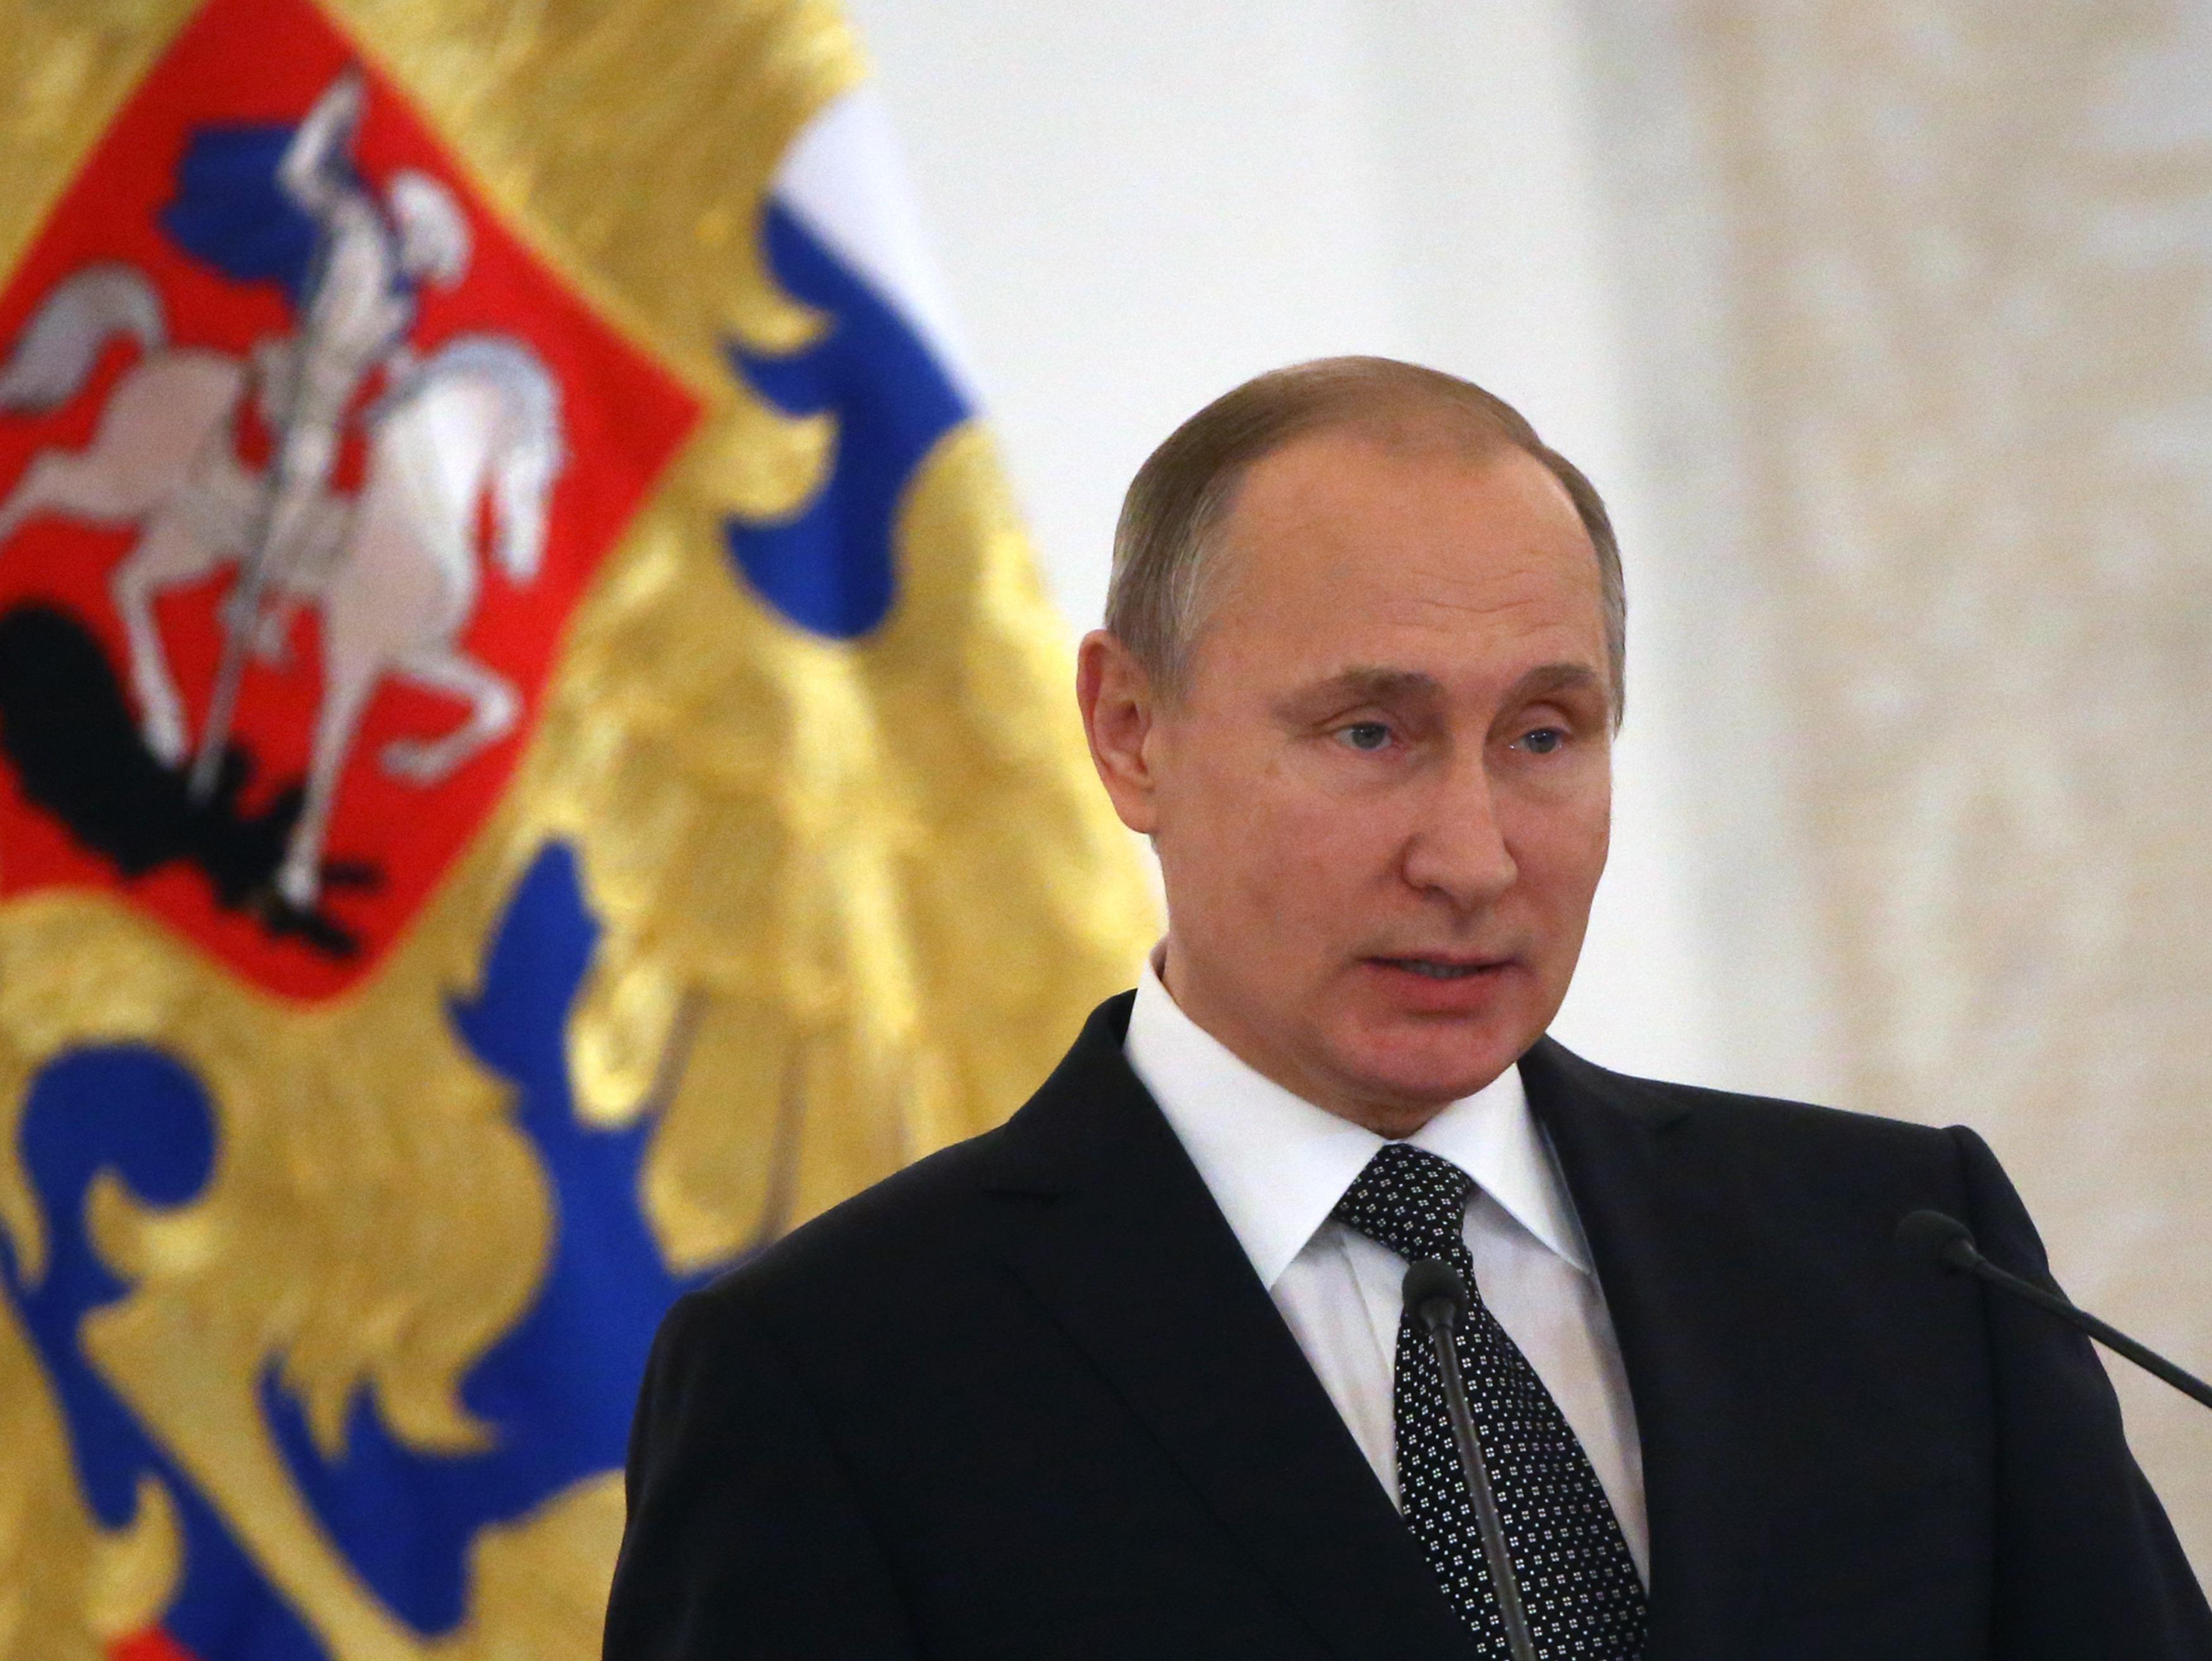 Russian President Vladimir Putin Attends Heroes Of The Farherland's Day Reception